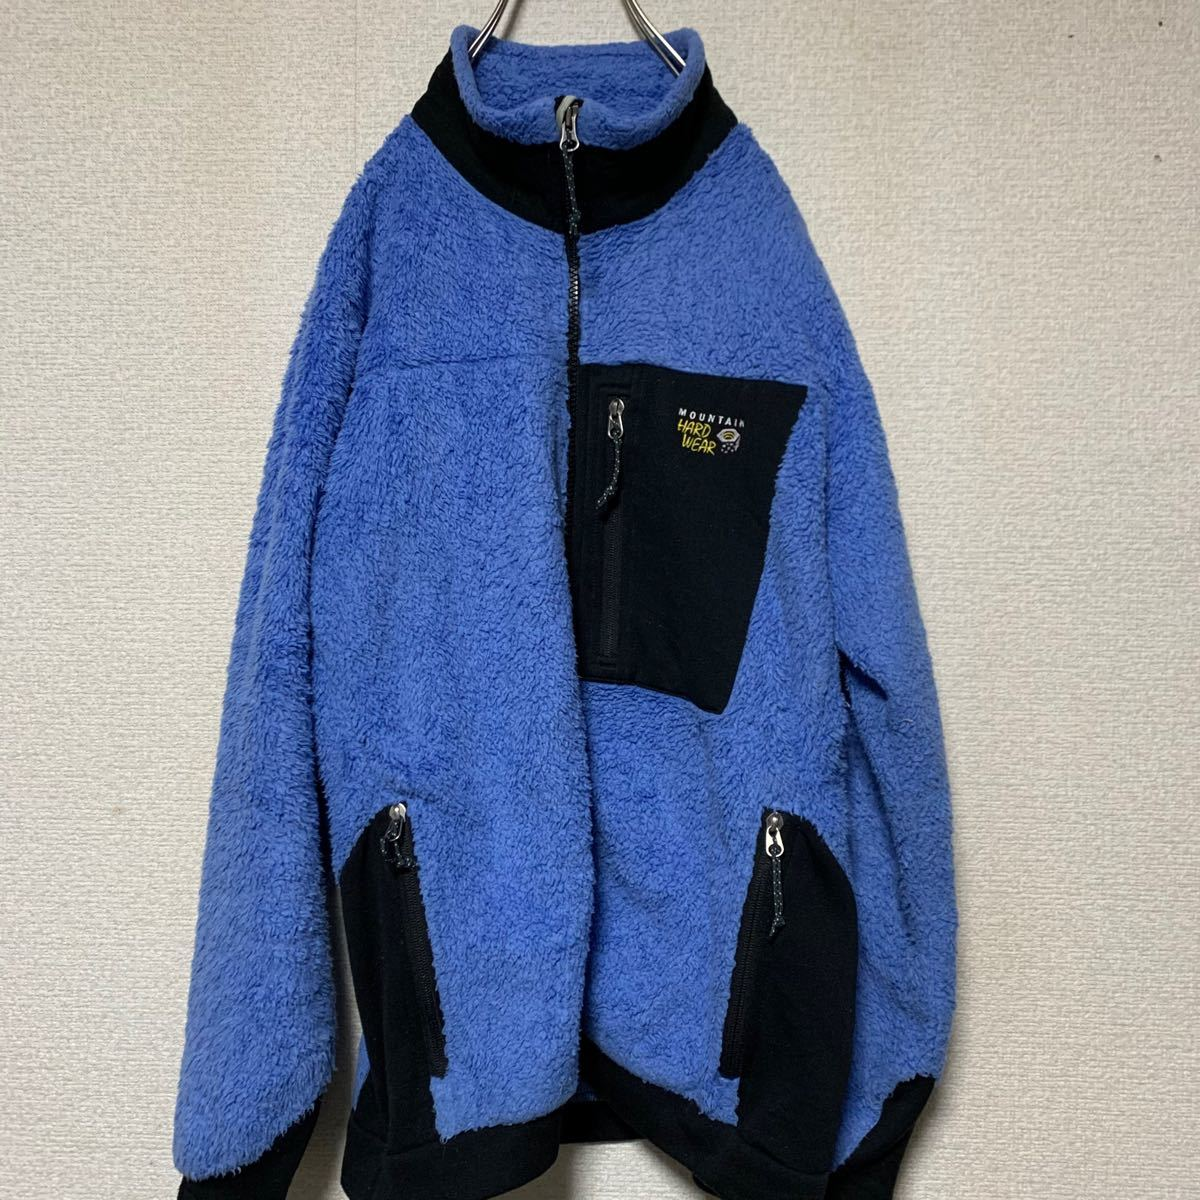 【90s】hard wear ハードウェア 水色 フリース  パタゴニア パタゴニア フリース レトロ フリースジャケット